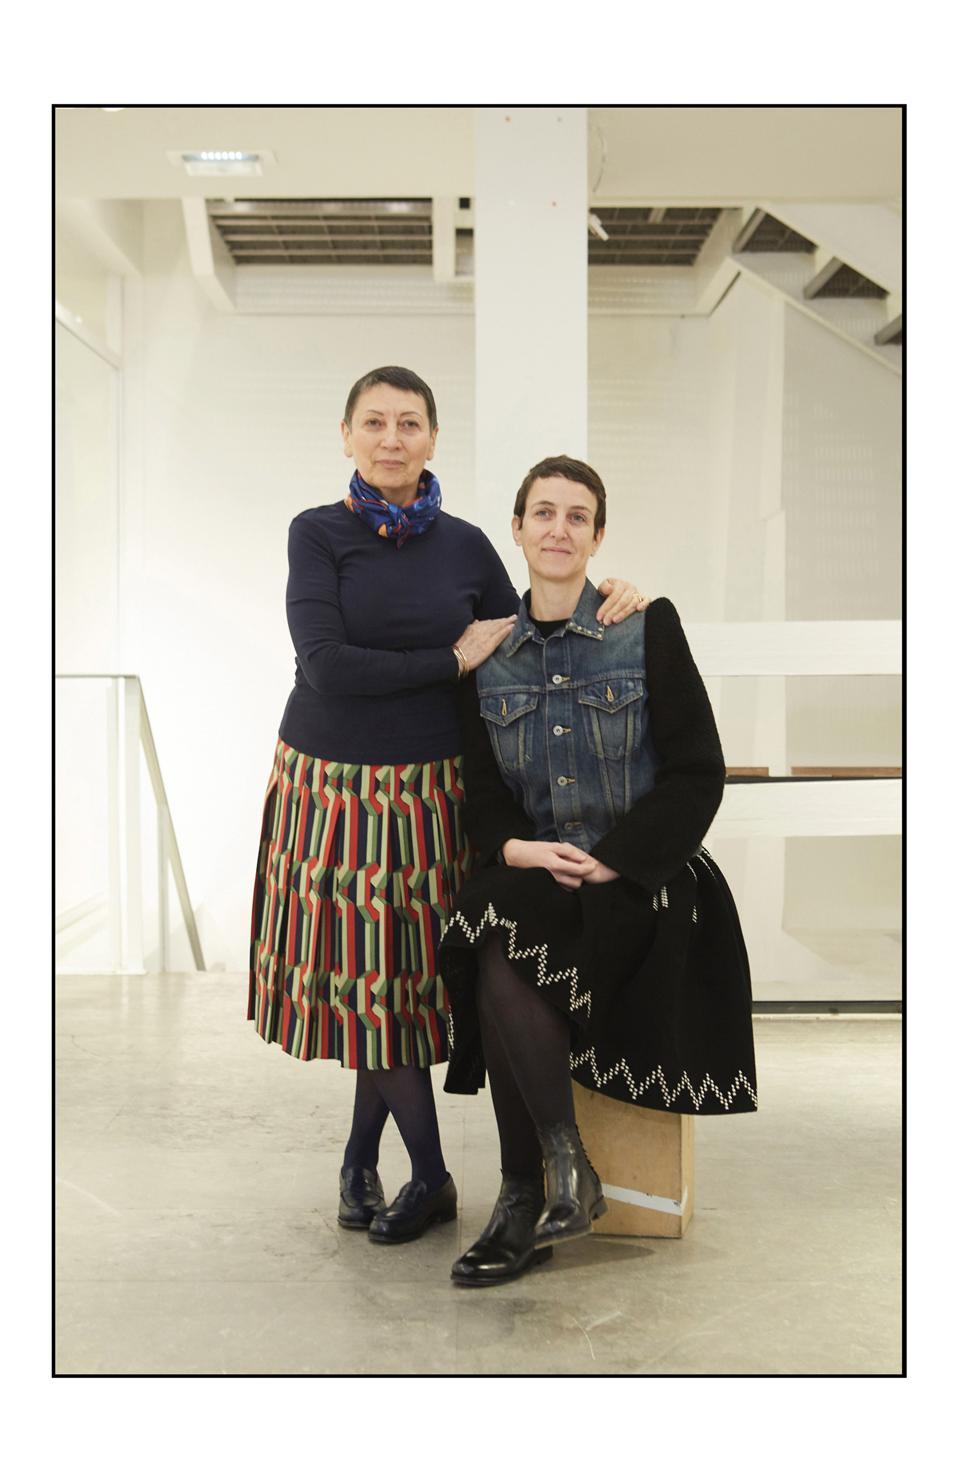 Colette Roussaux and Sarah Andelman, co-founders of colette at 213 rue Saint Honoré store.